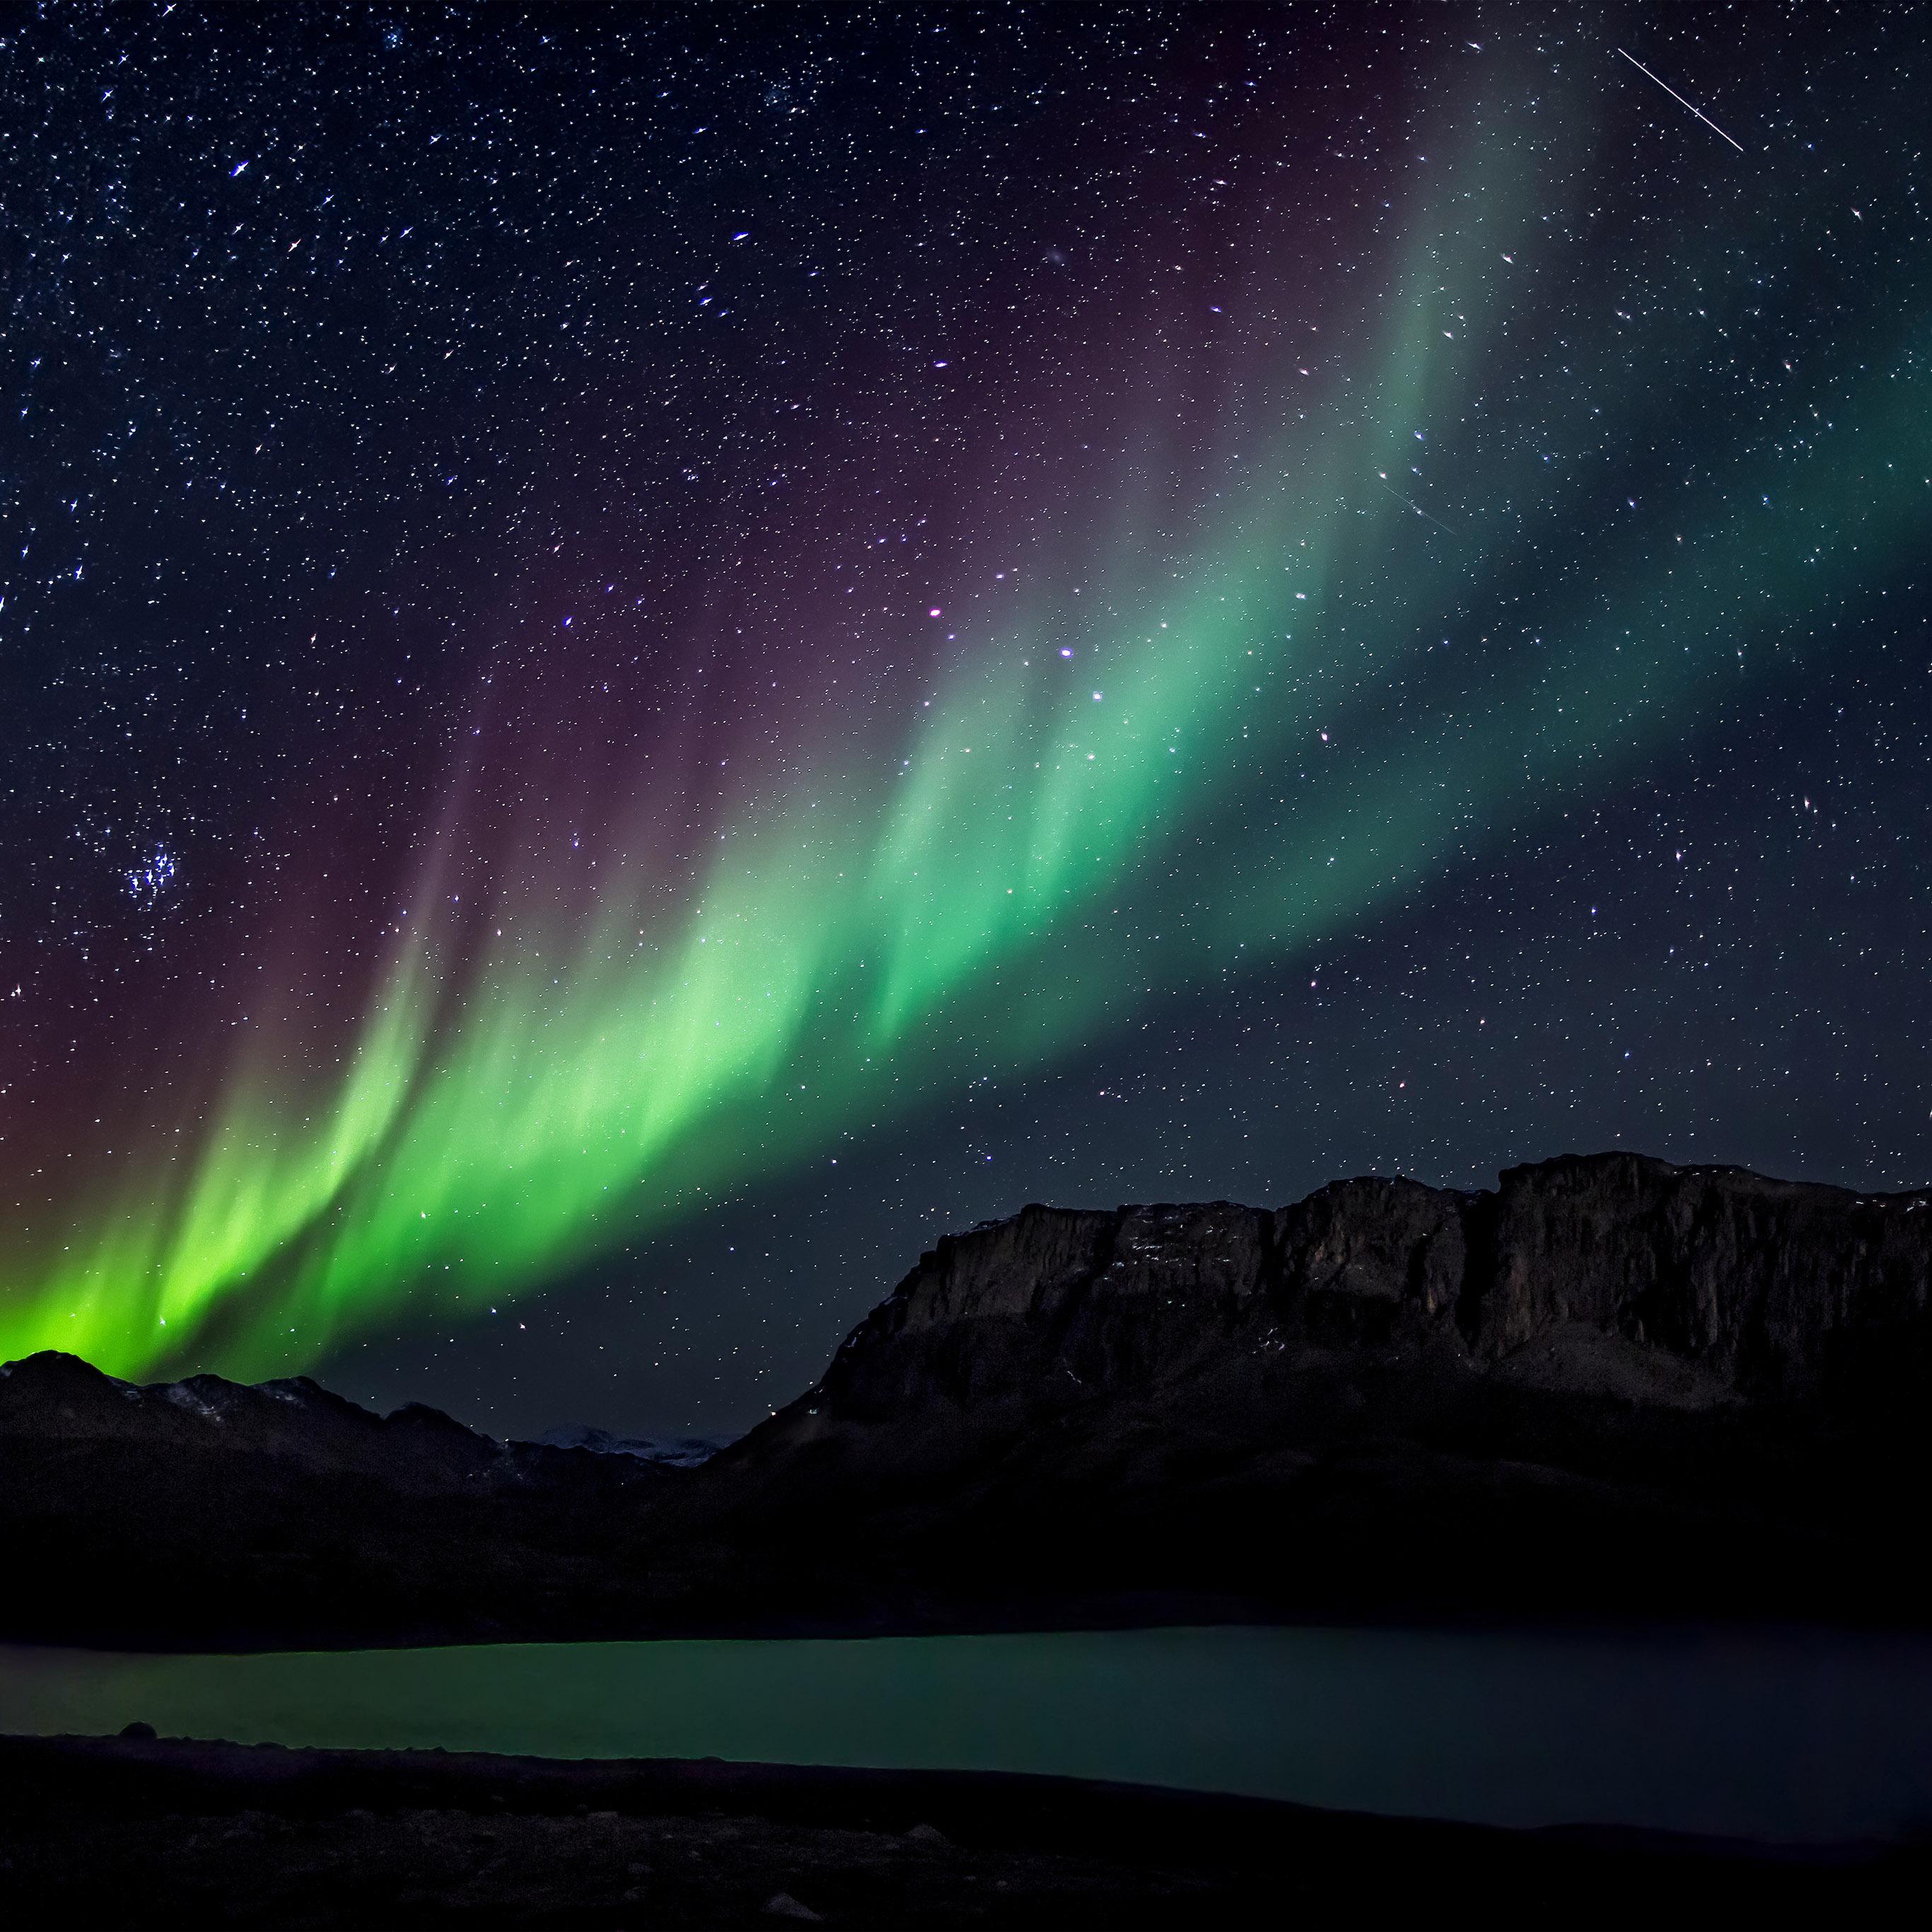 my60-aurora-night-sky-star-space-nature-green-wallpaper  Night Sky Aurora Colorado